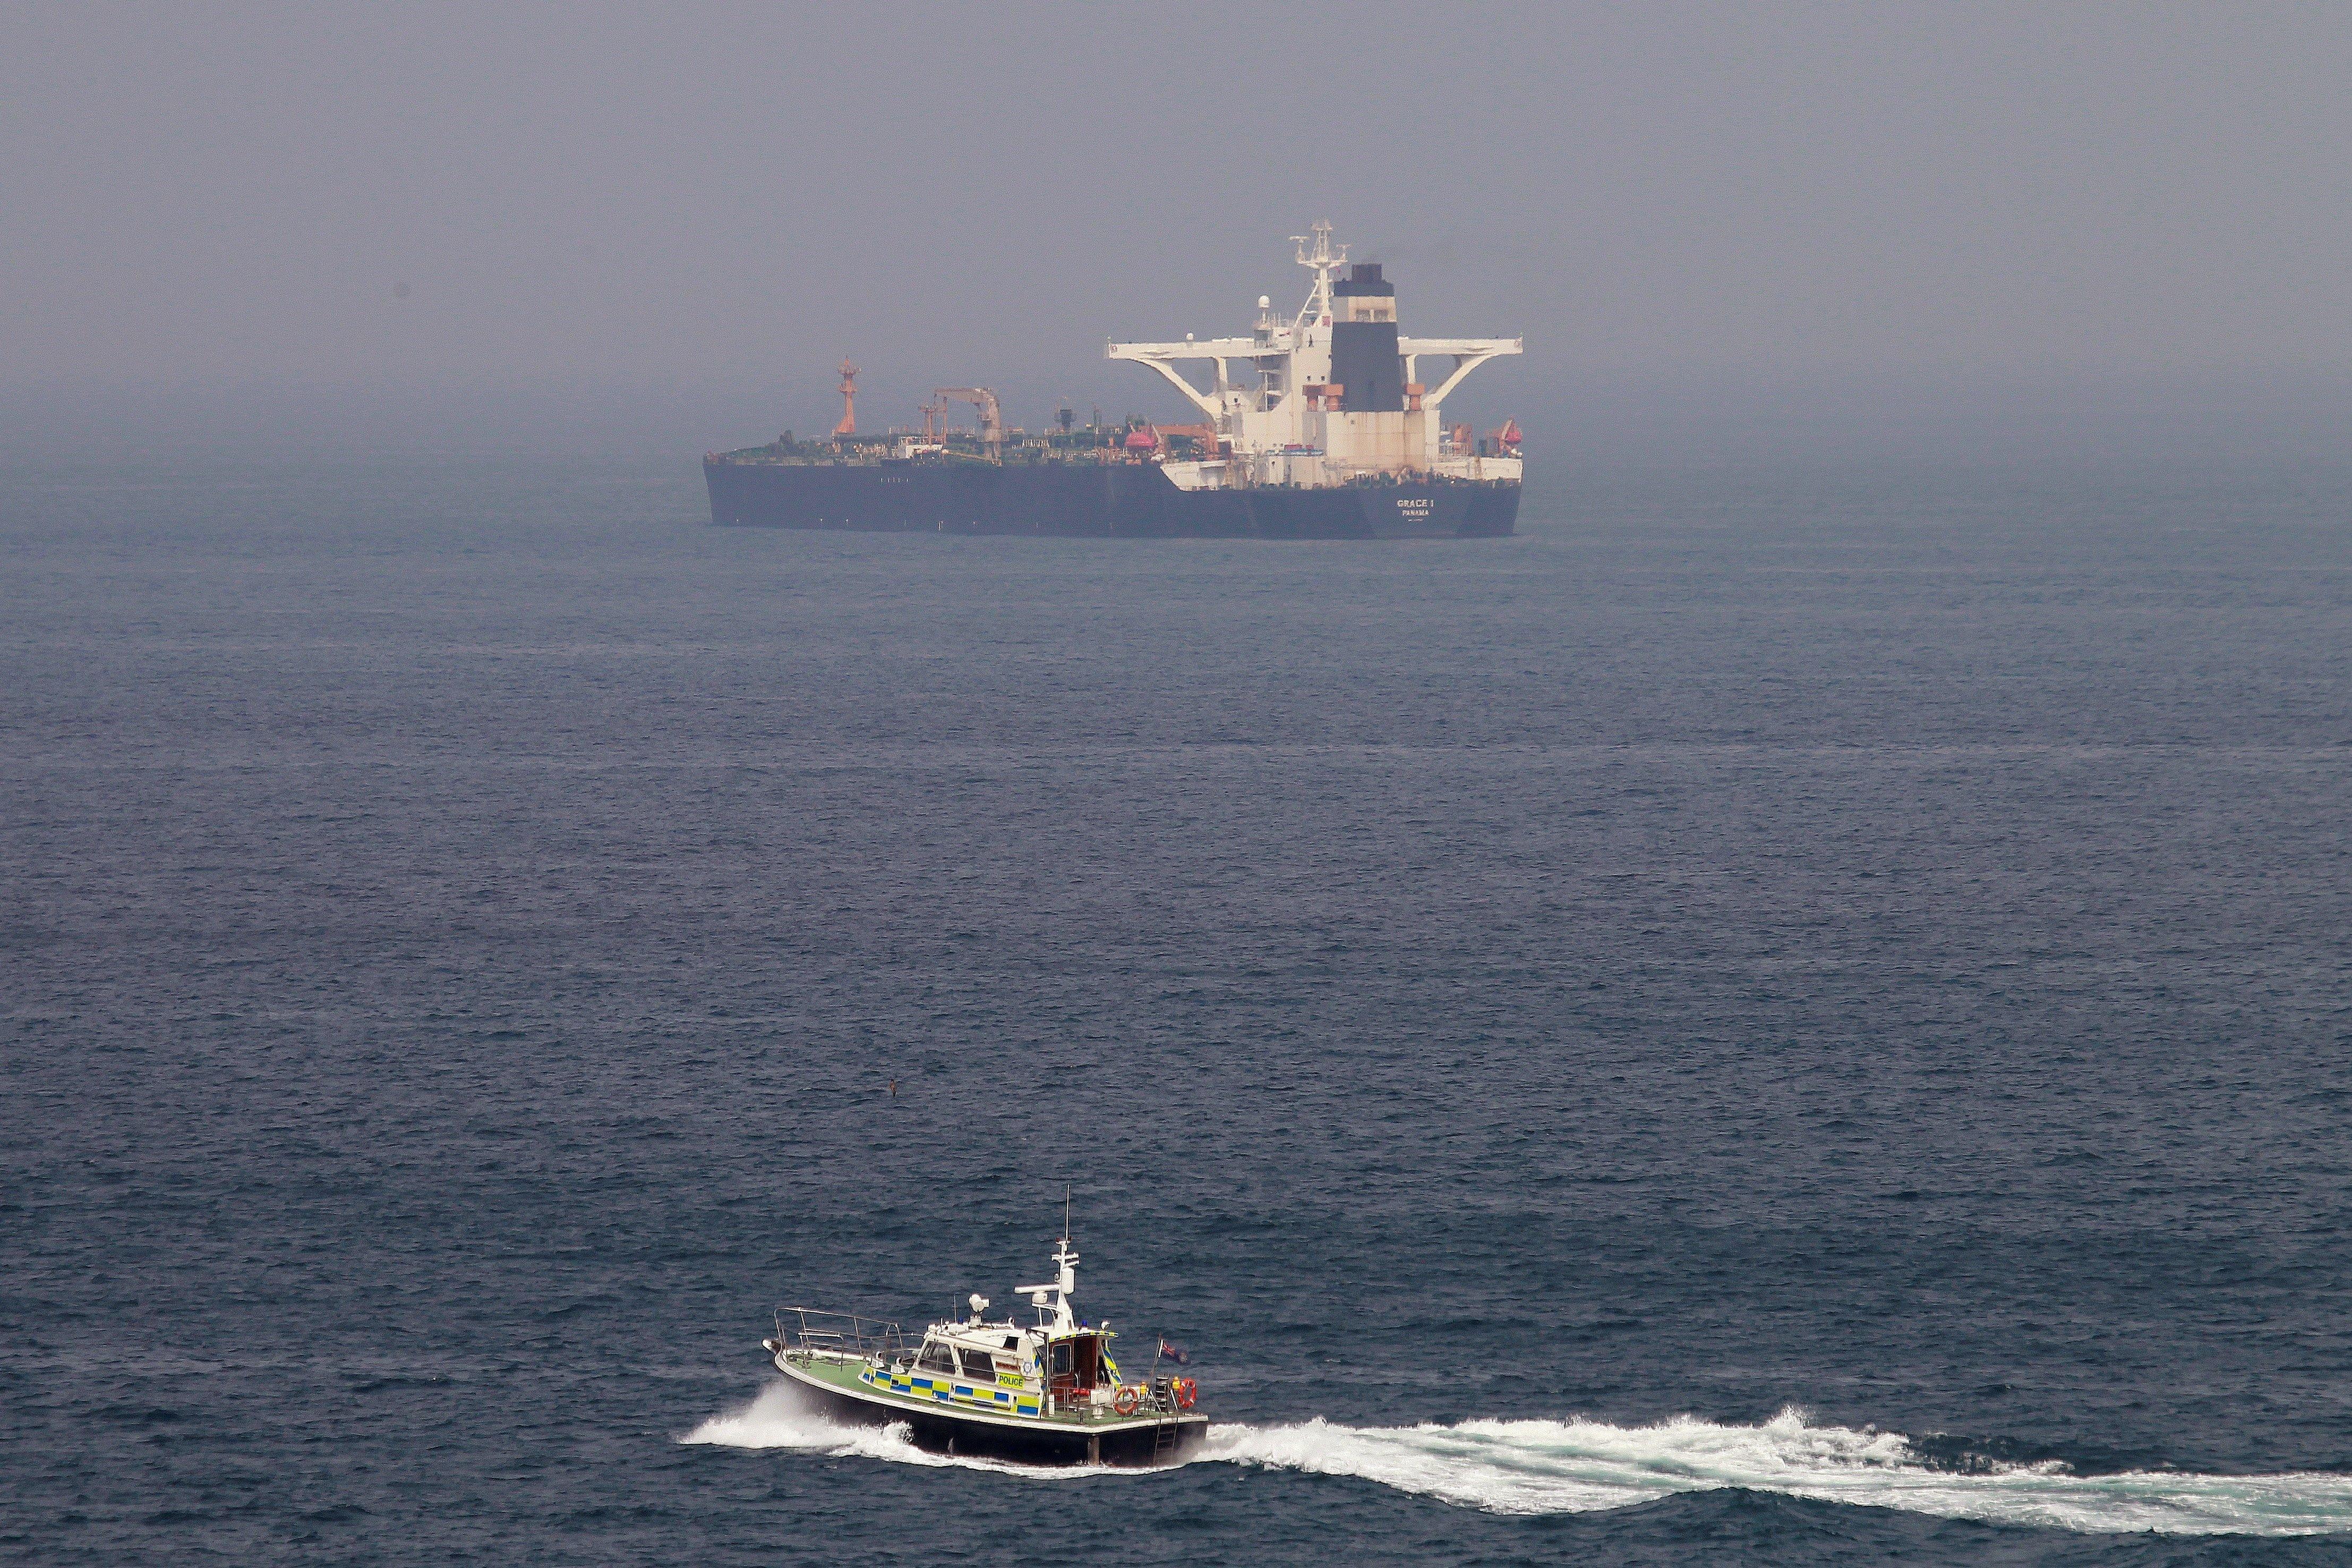 Petroler iran gibraltar - Efe